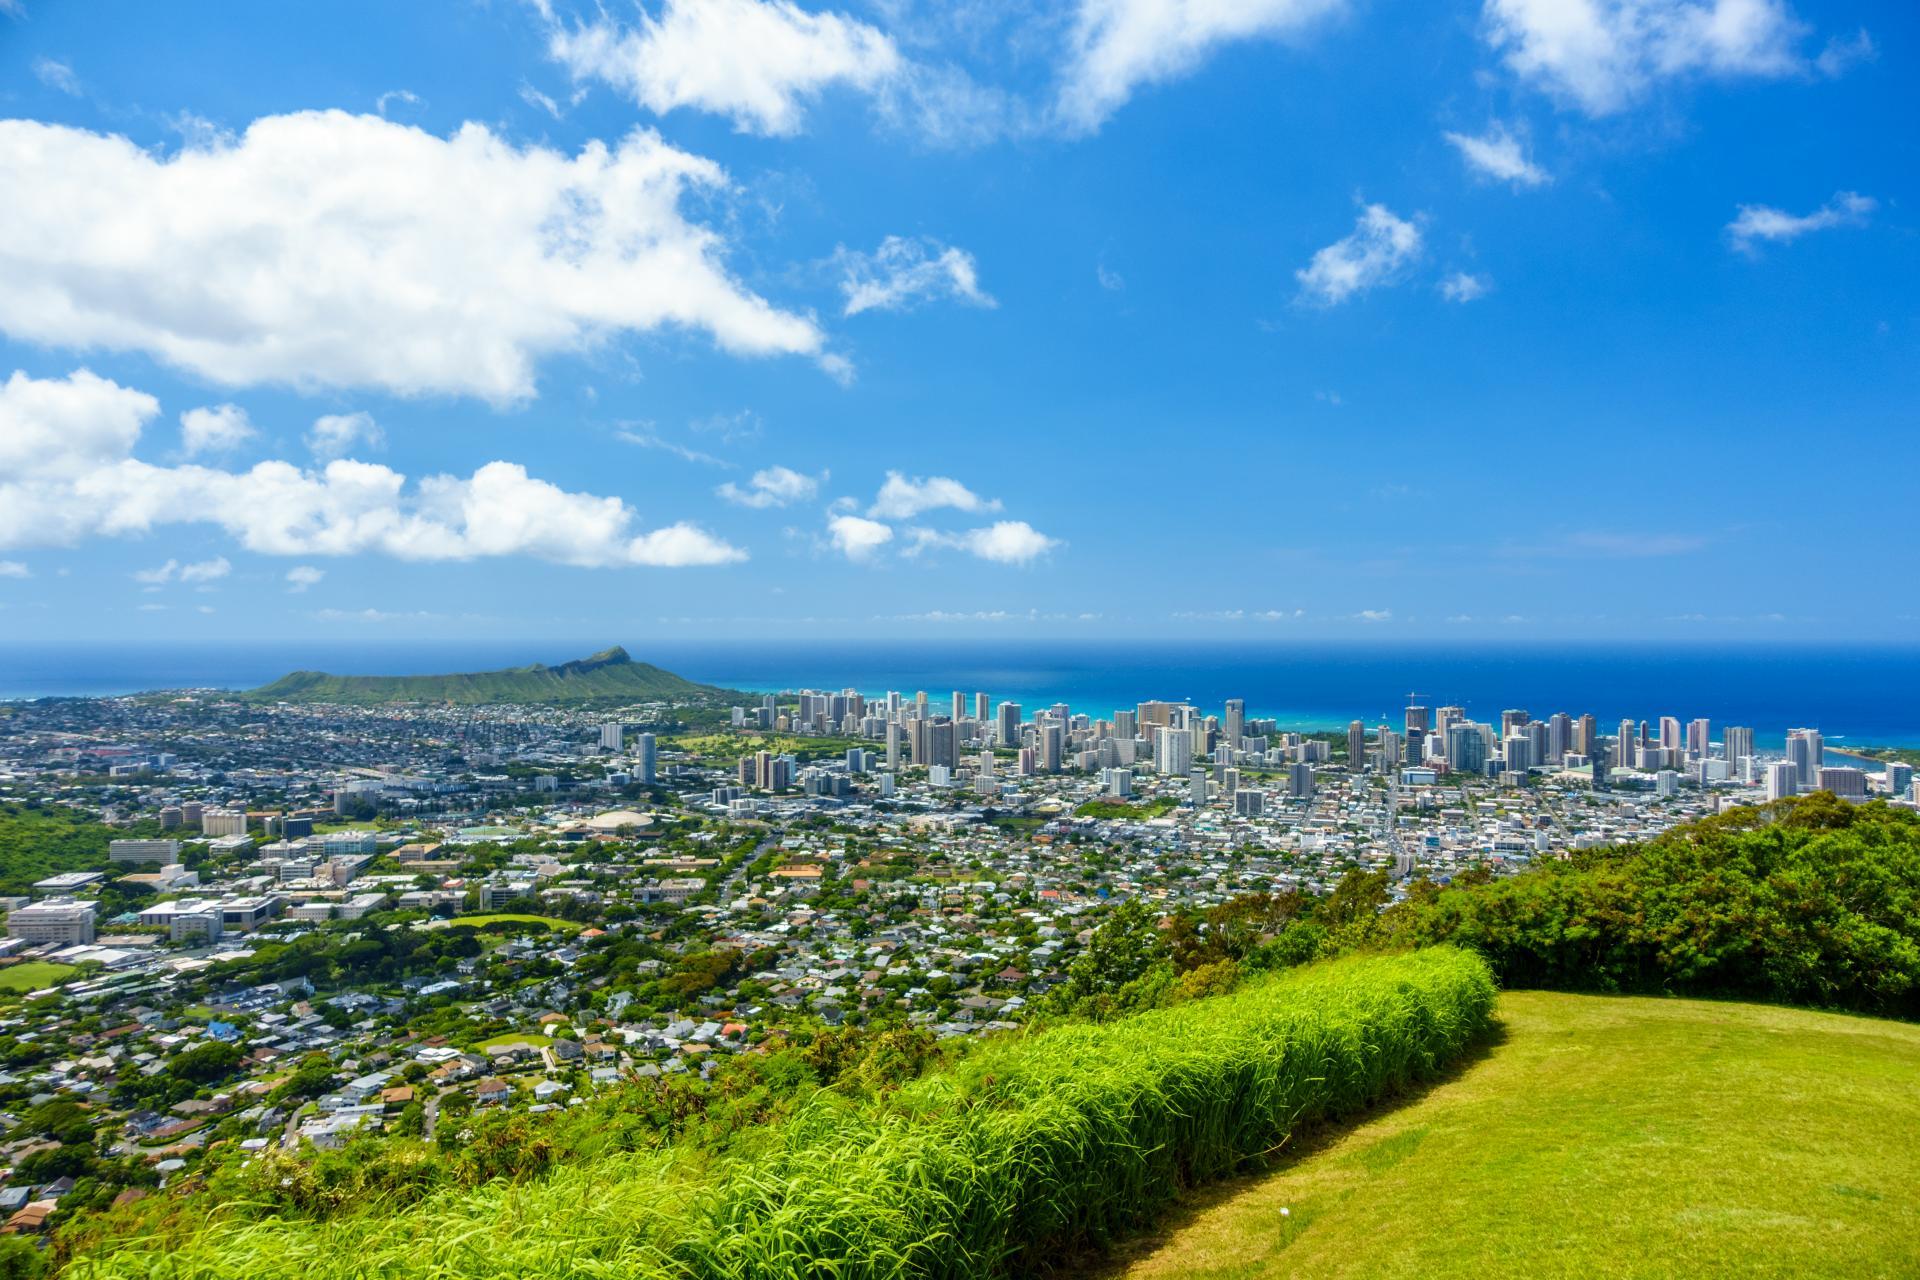 Oahu Honolulu View from Tantalus lookout